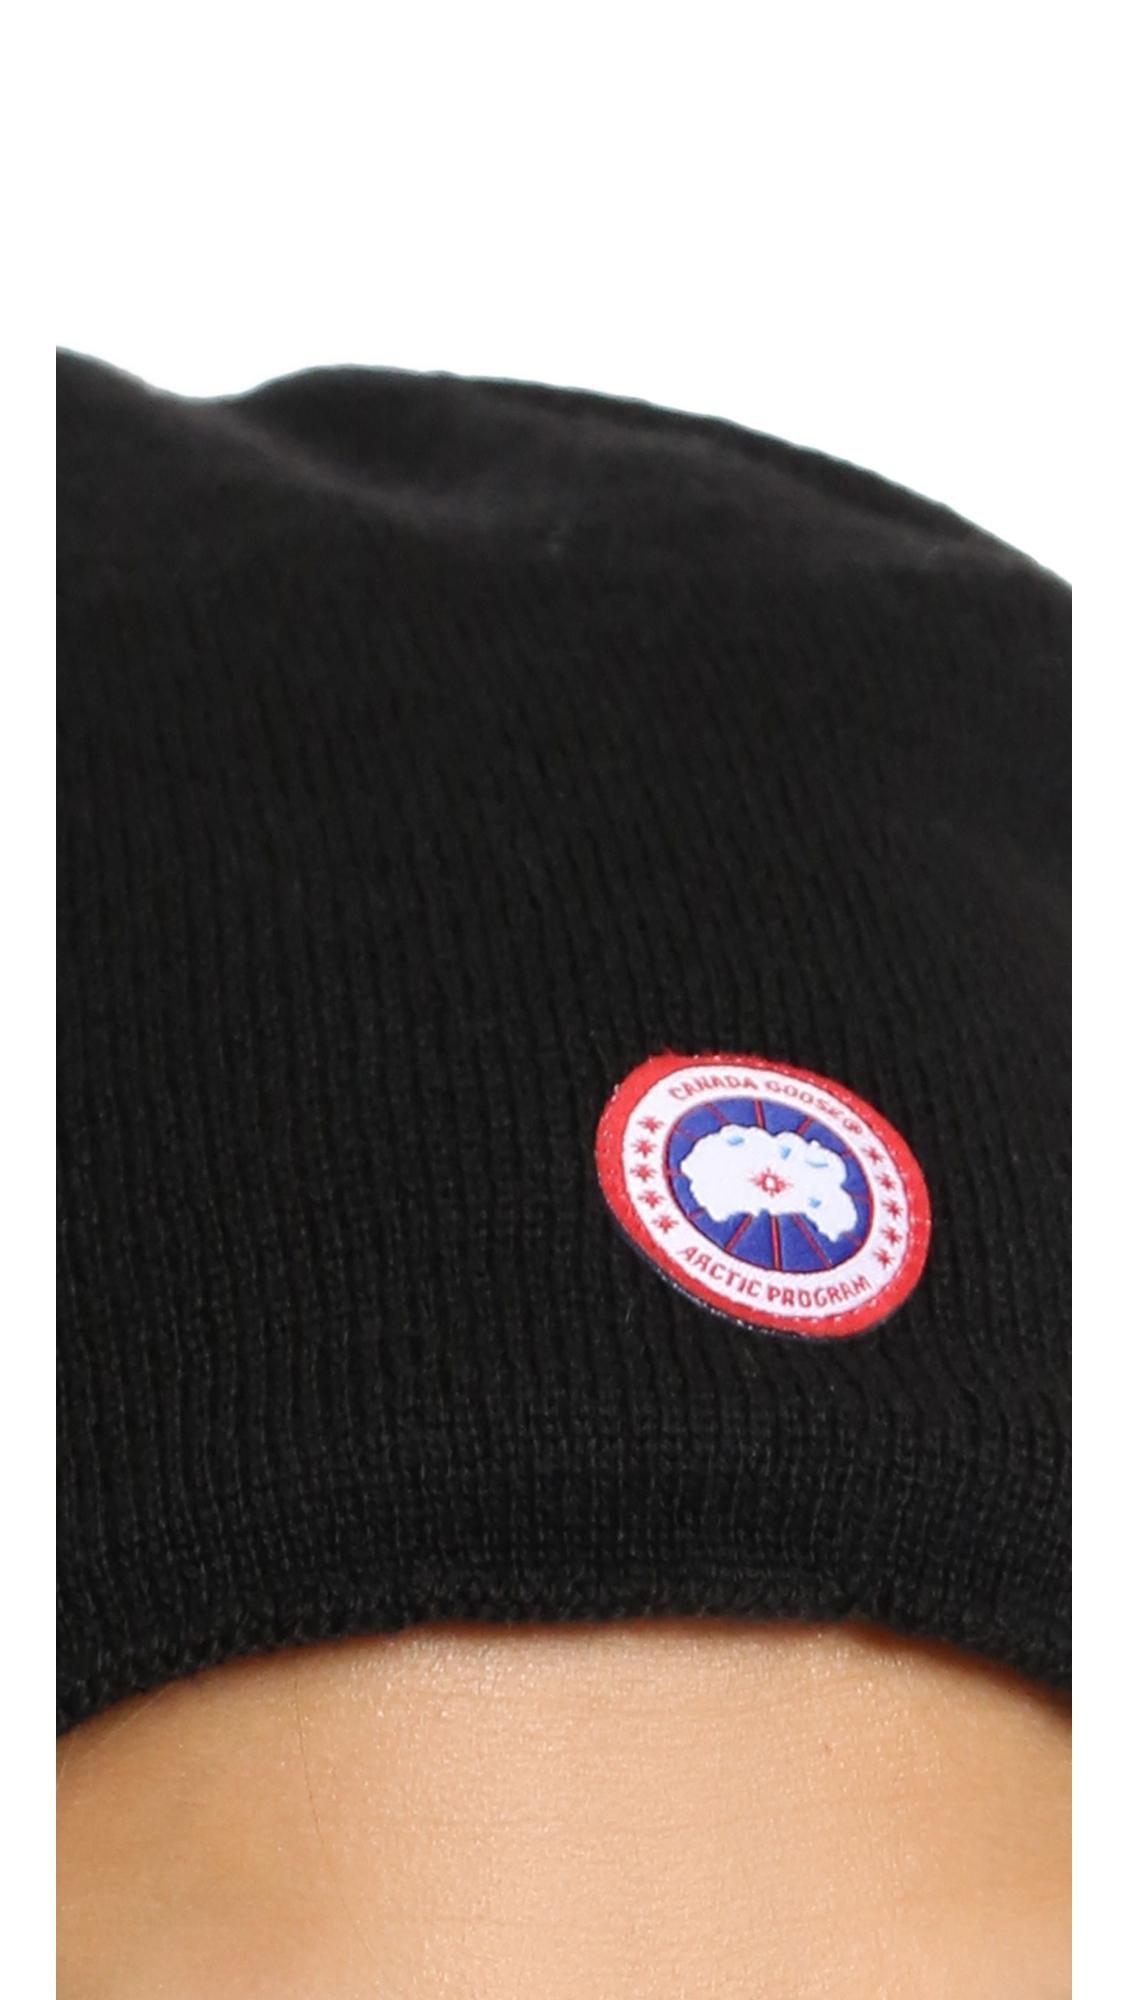 Canada Goose mens replica official - Canada goose Merino Wool Beanie - Graphite in Black | Lyst